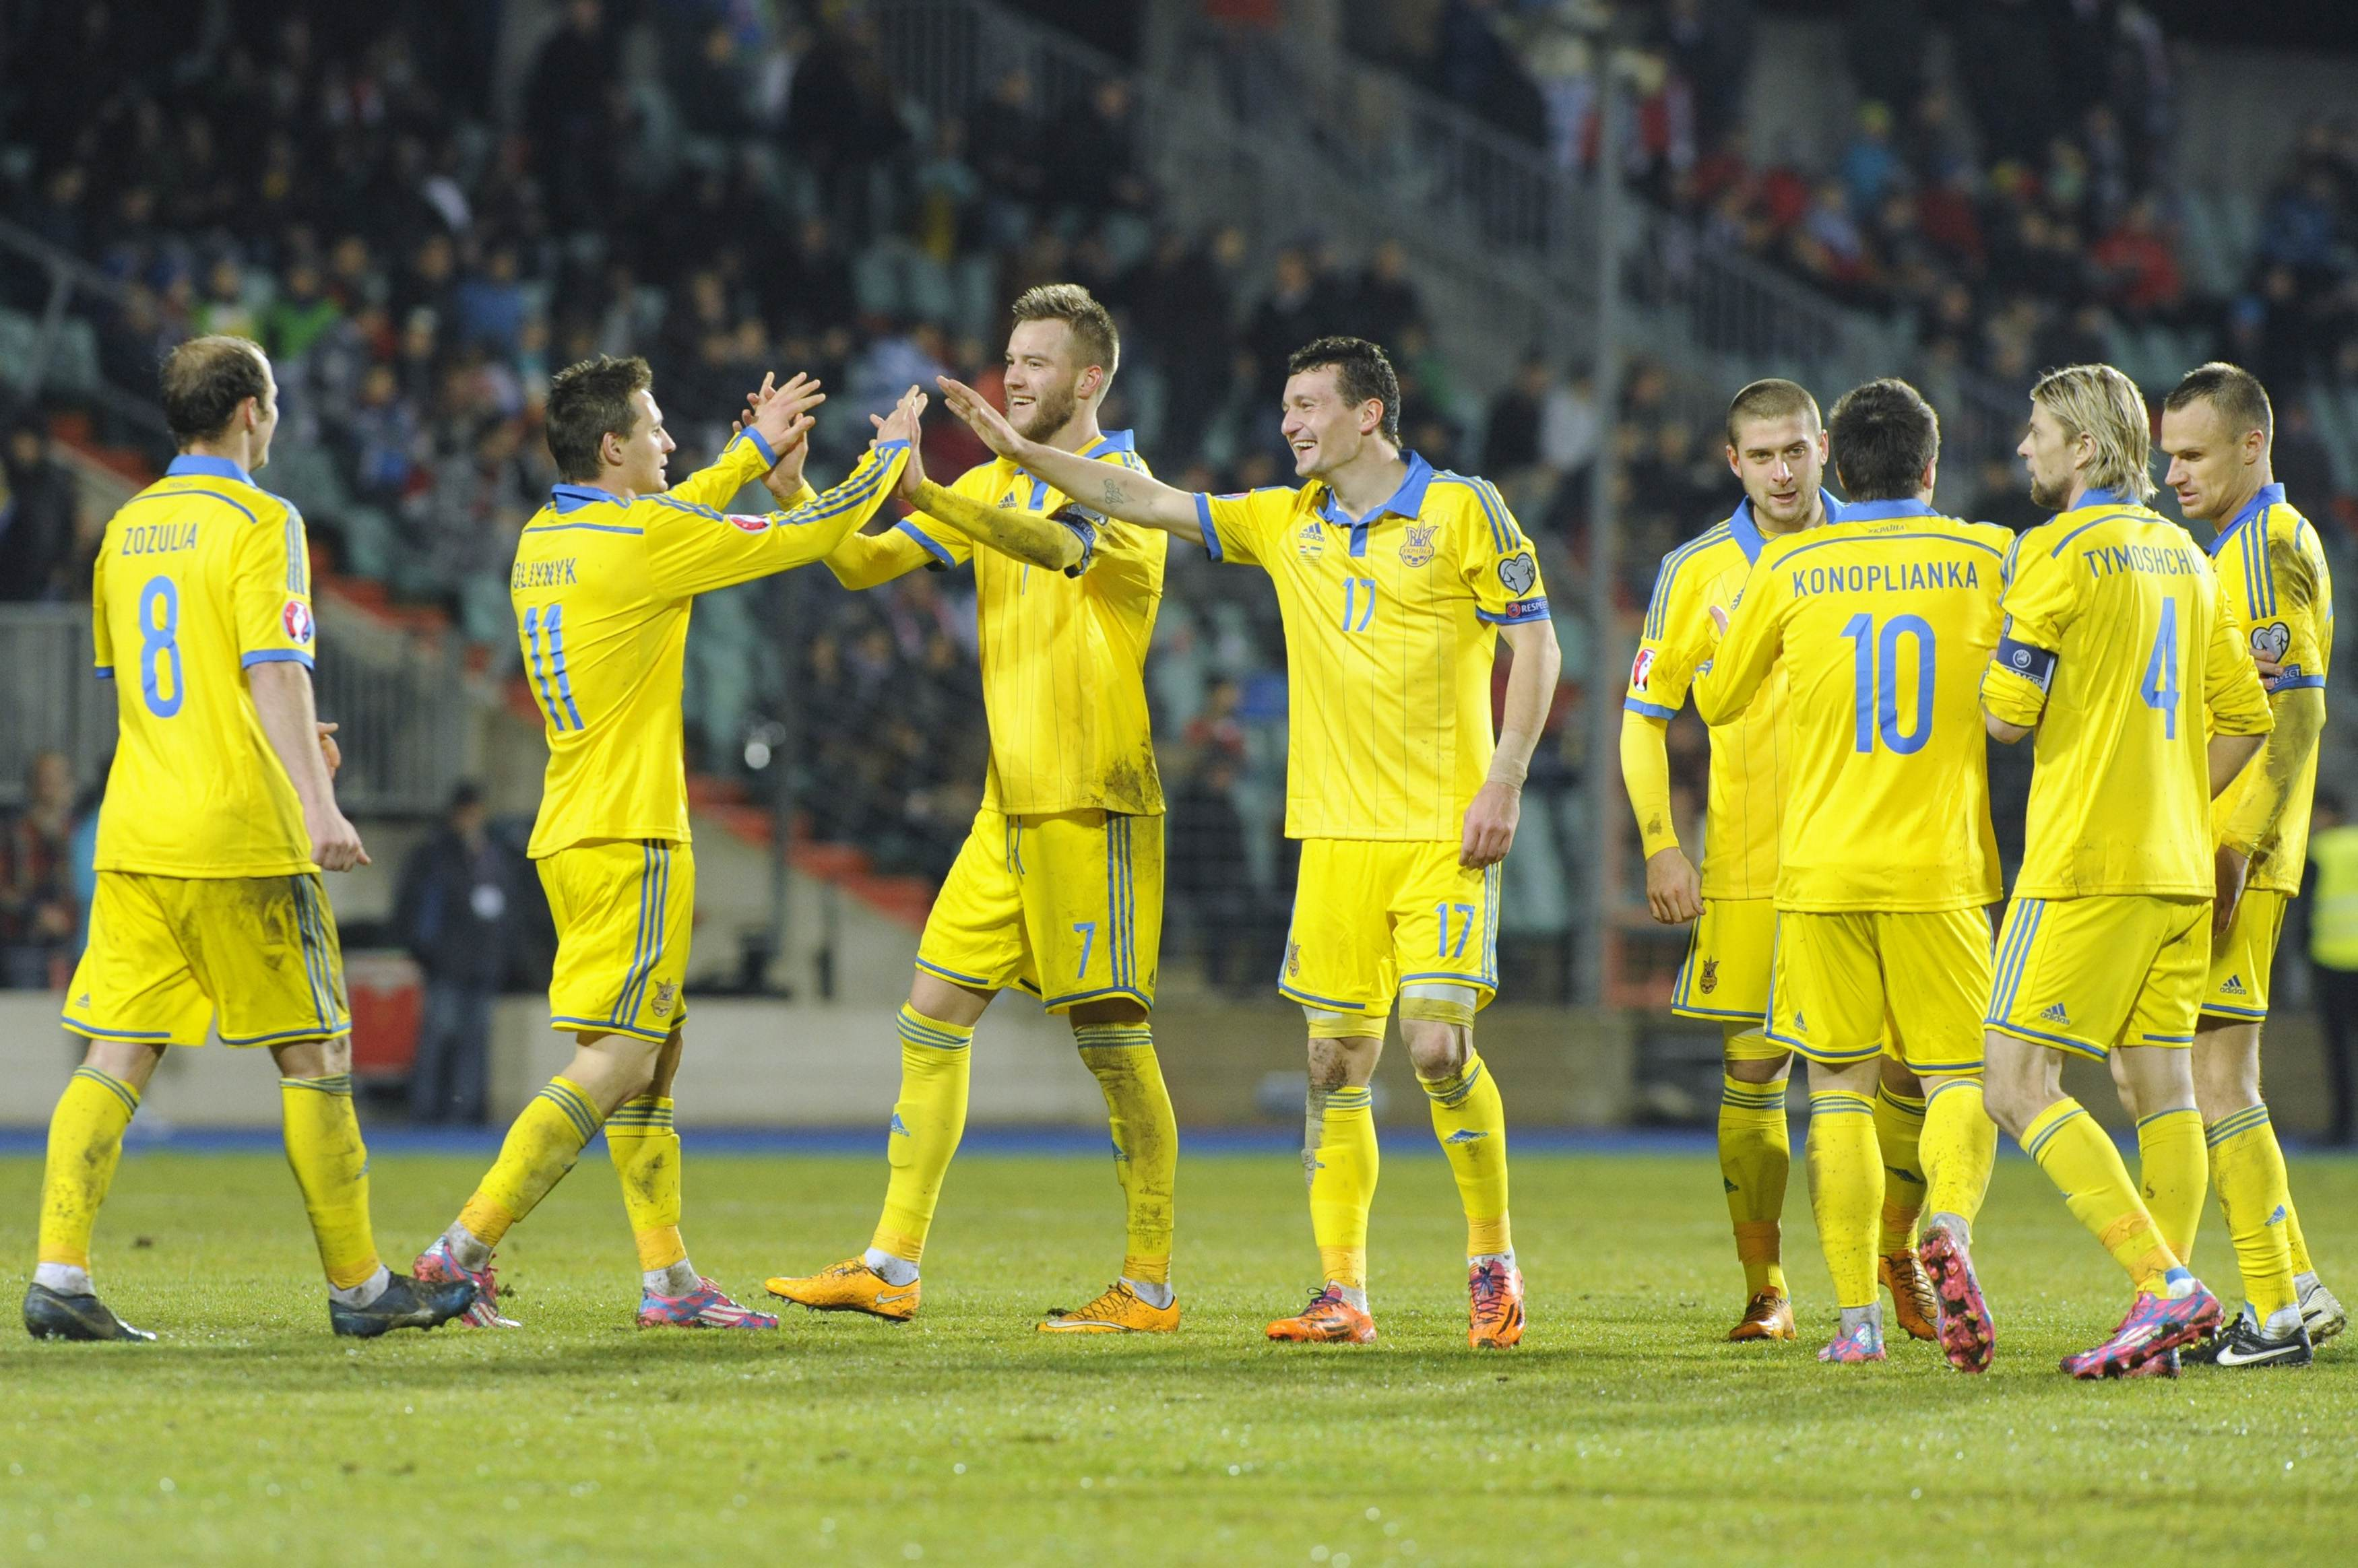 Трансляция матча Украина — Кипр, 24 марта 2016